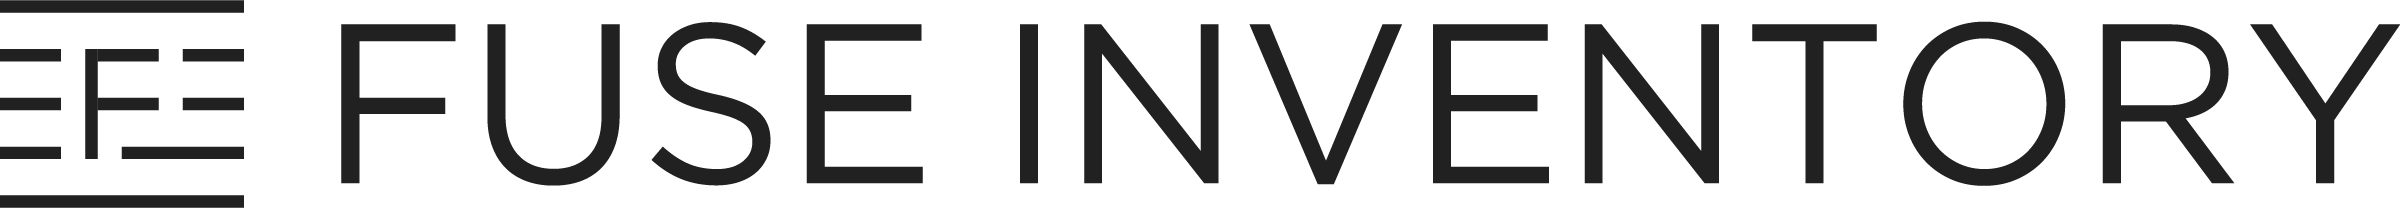 Fuse Inventory logo